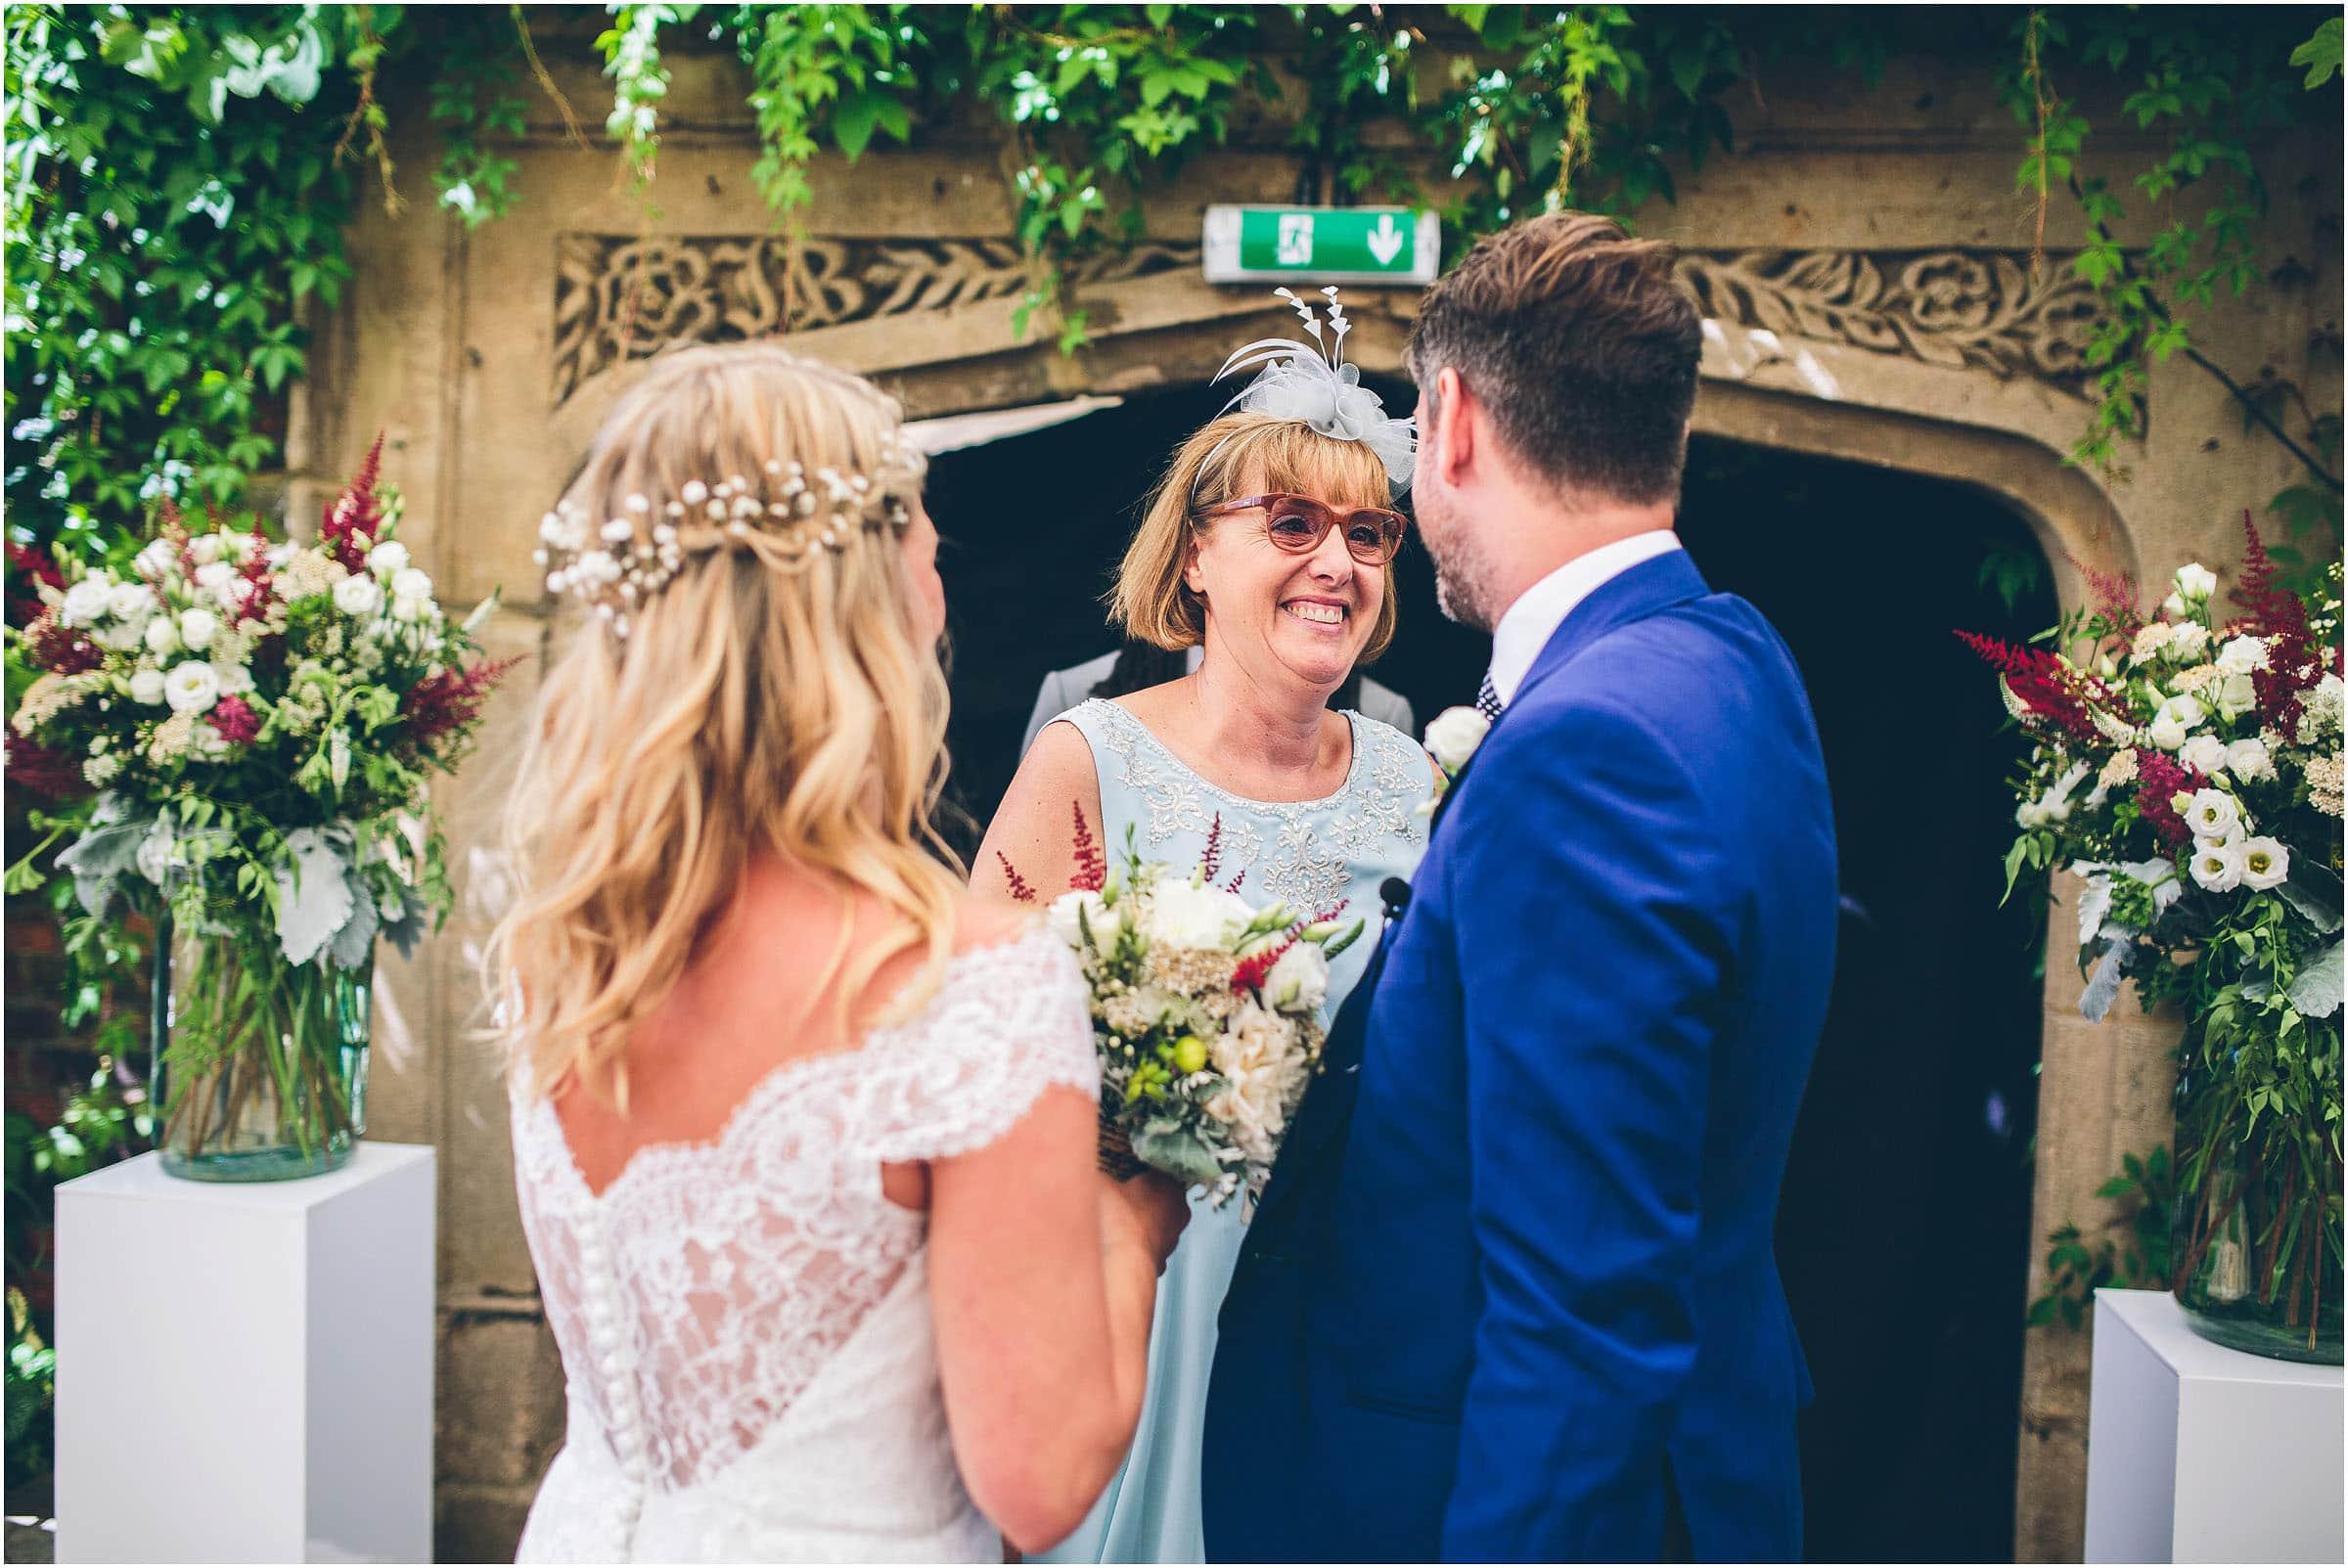 Kensington_Roof_Gardens_Wedding_Photography_0032